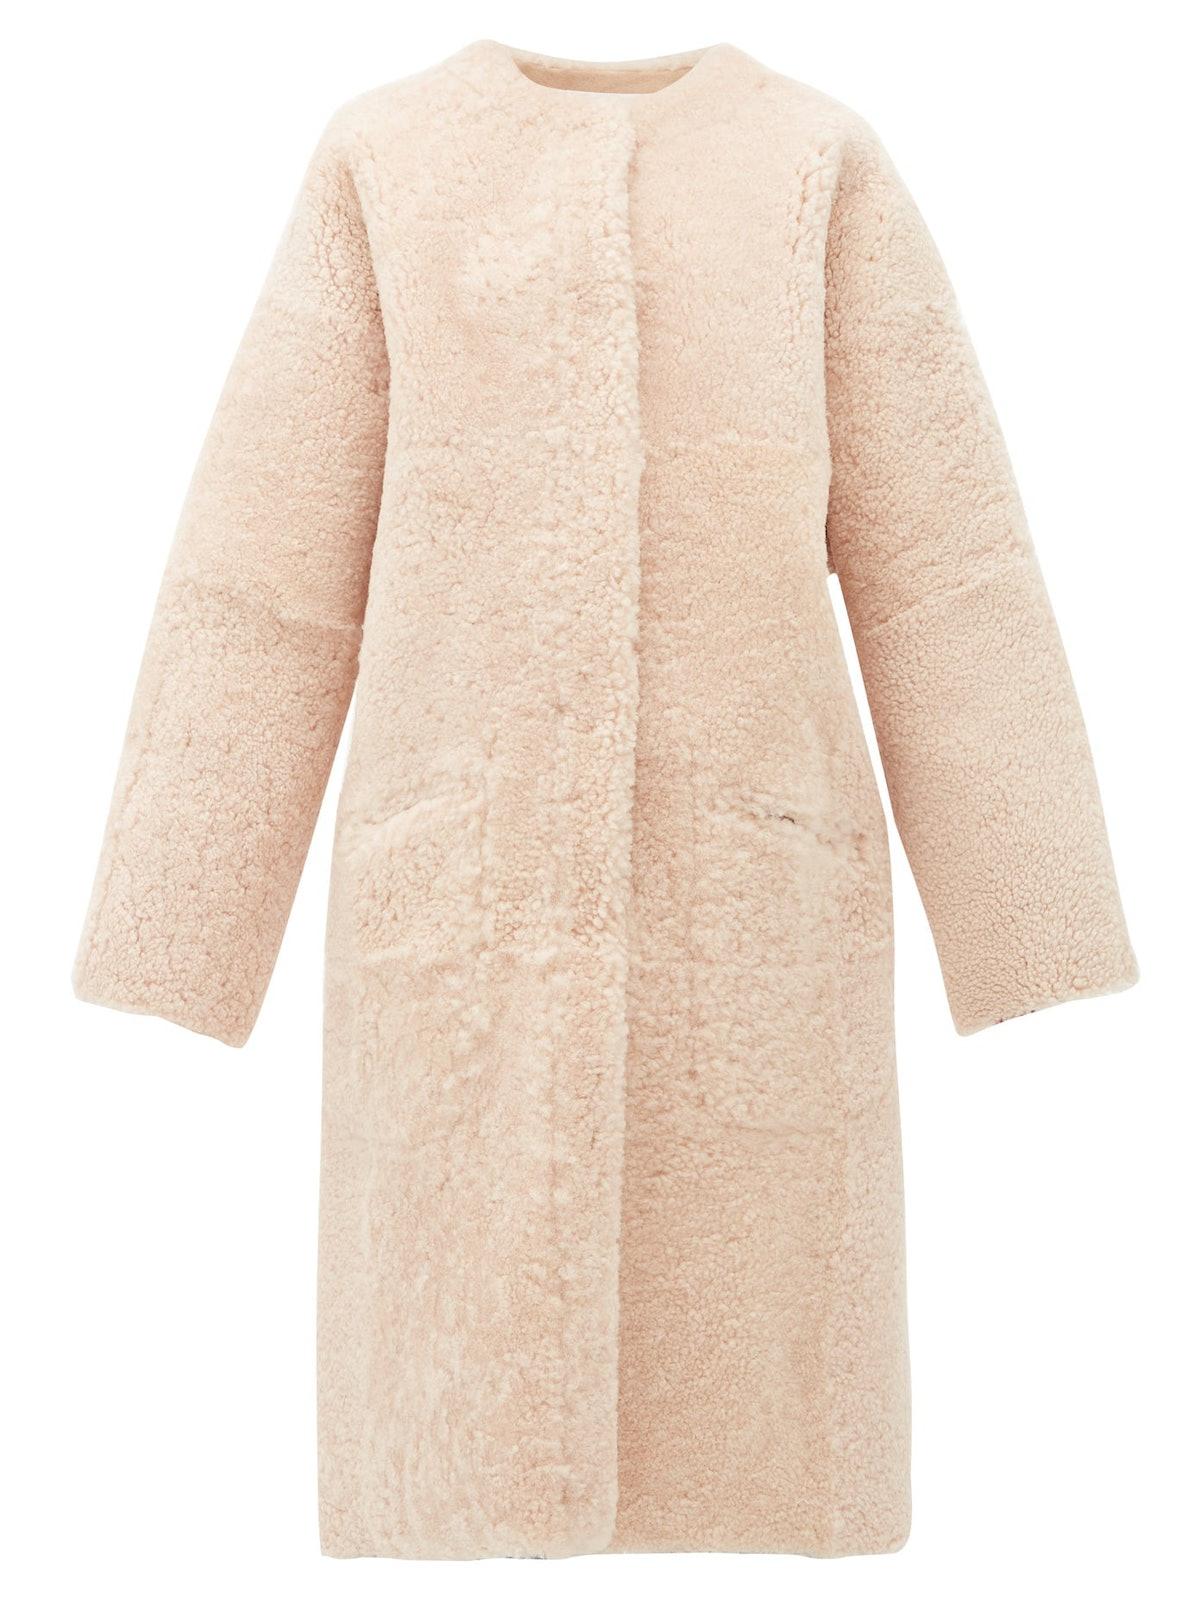 Long-Line Reversible Shearling Coat